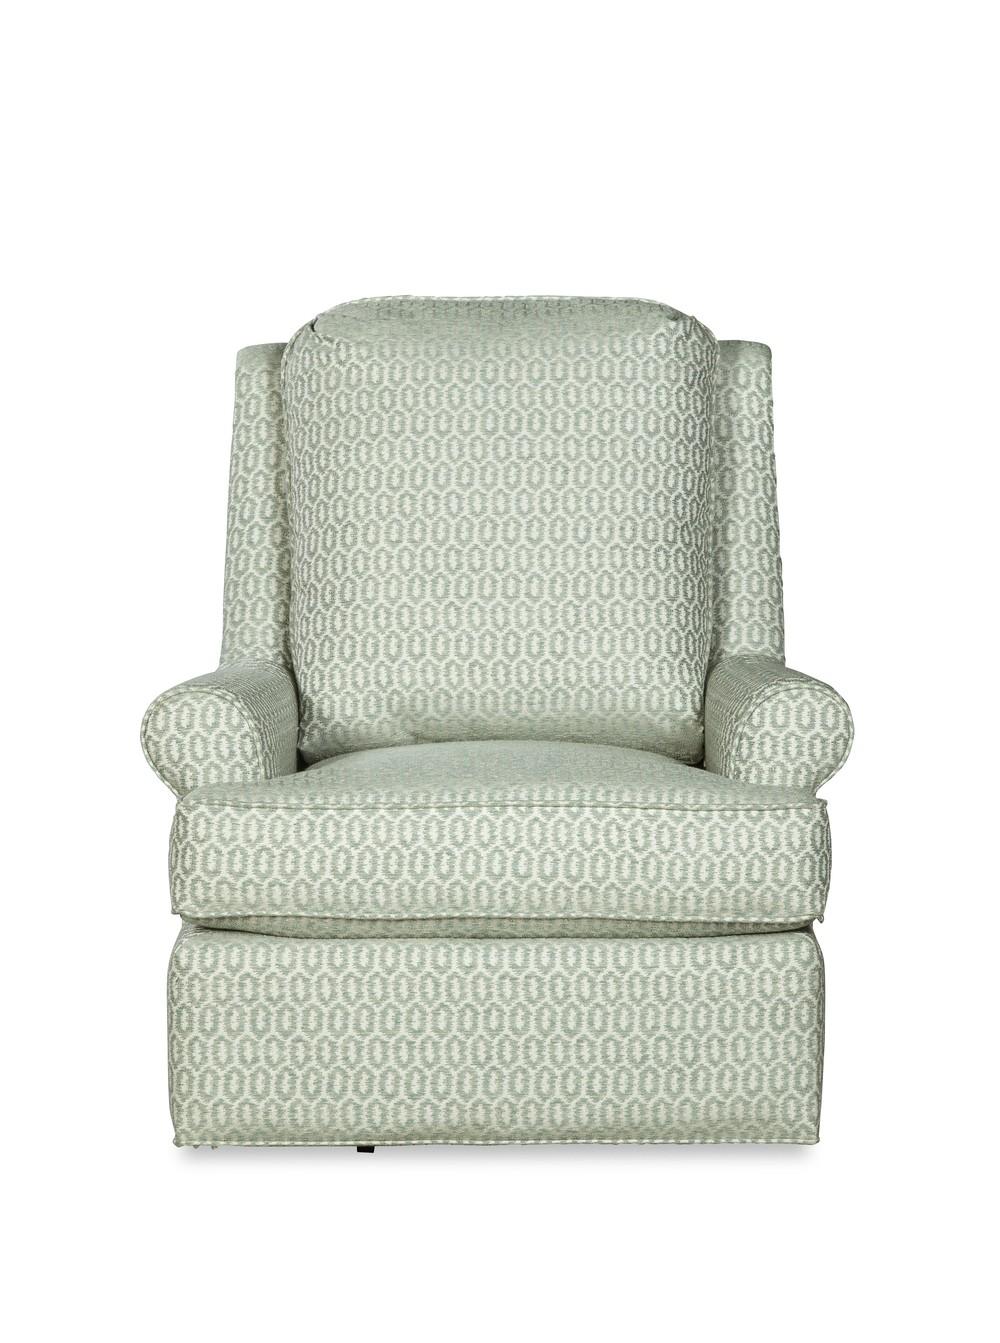 Paula Deen Home By Craftmaster - Swivel Chair